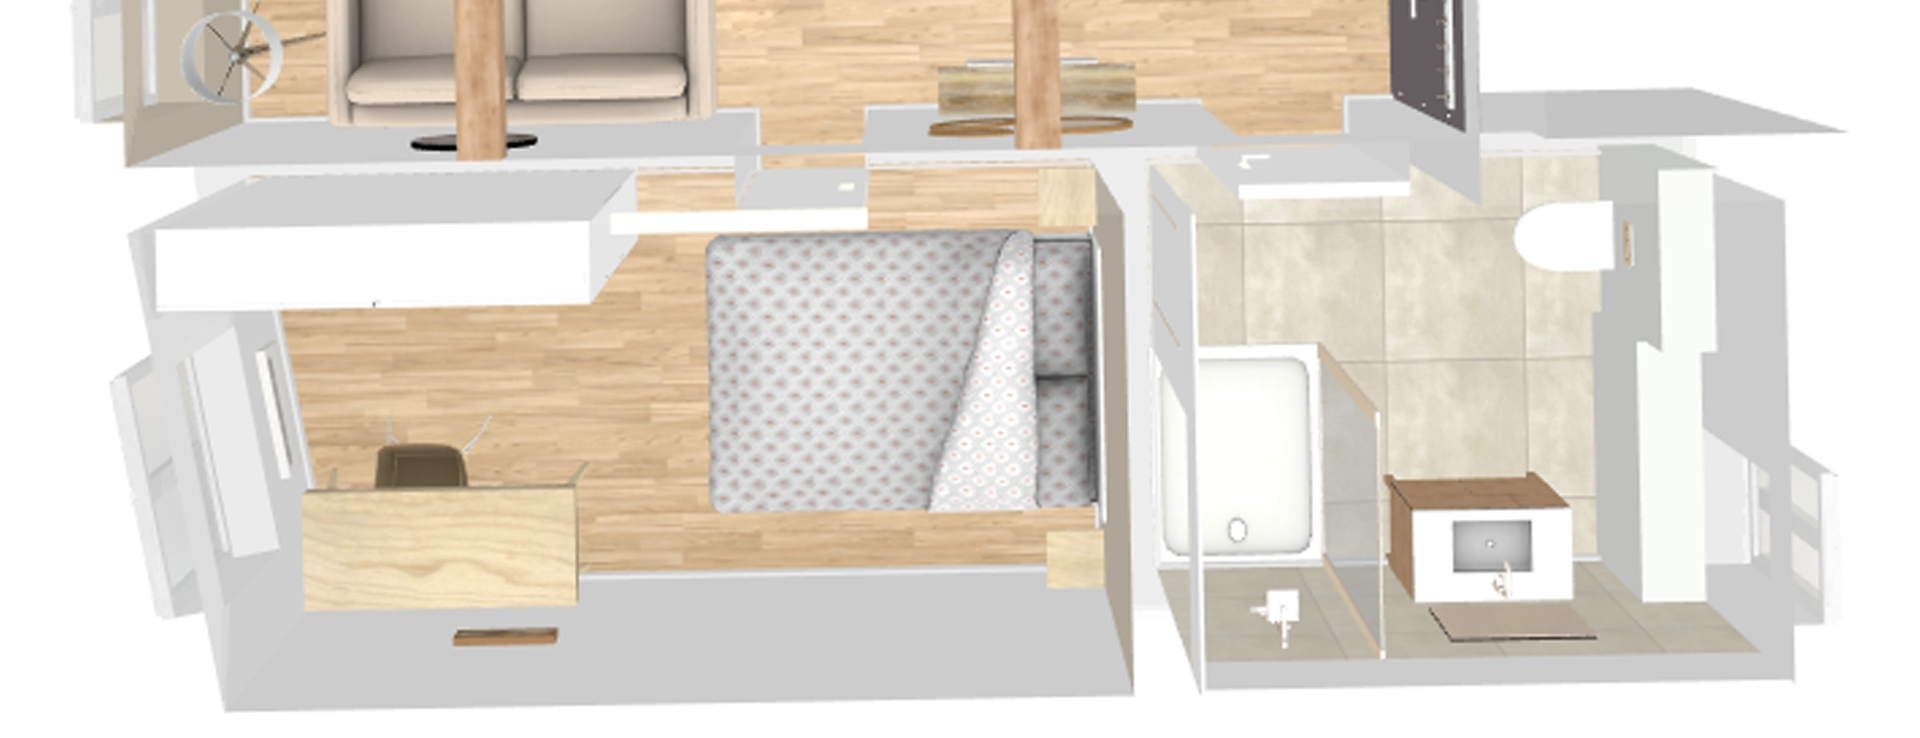 Appartement Avignon 9